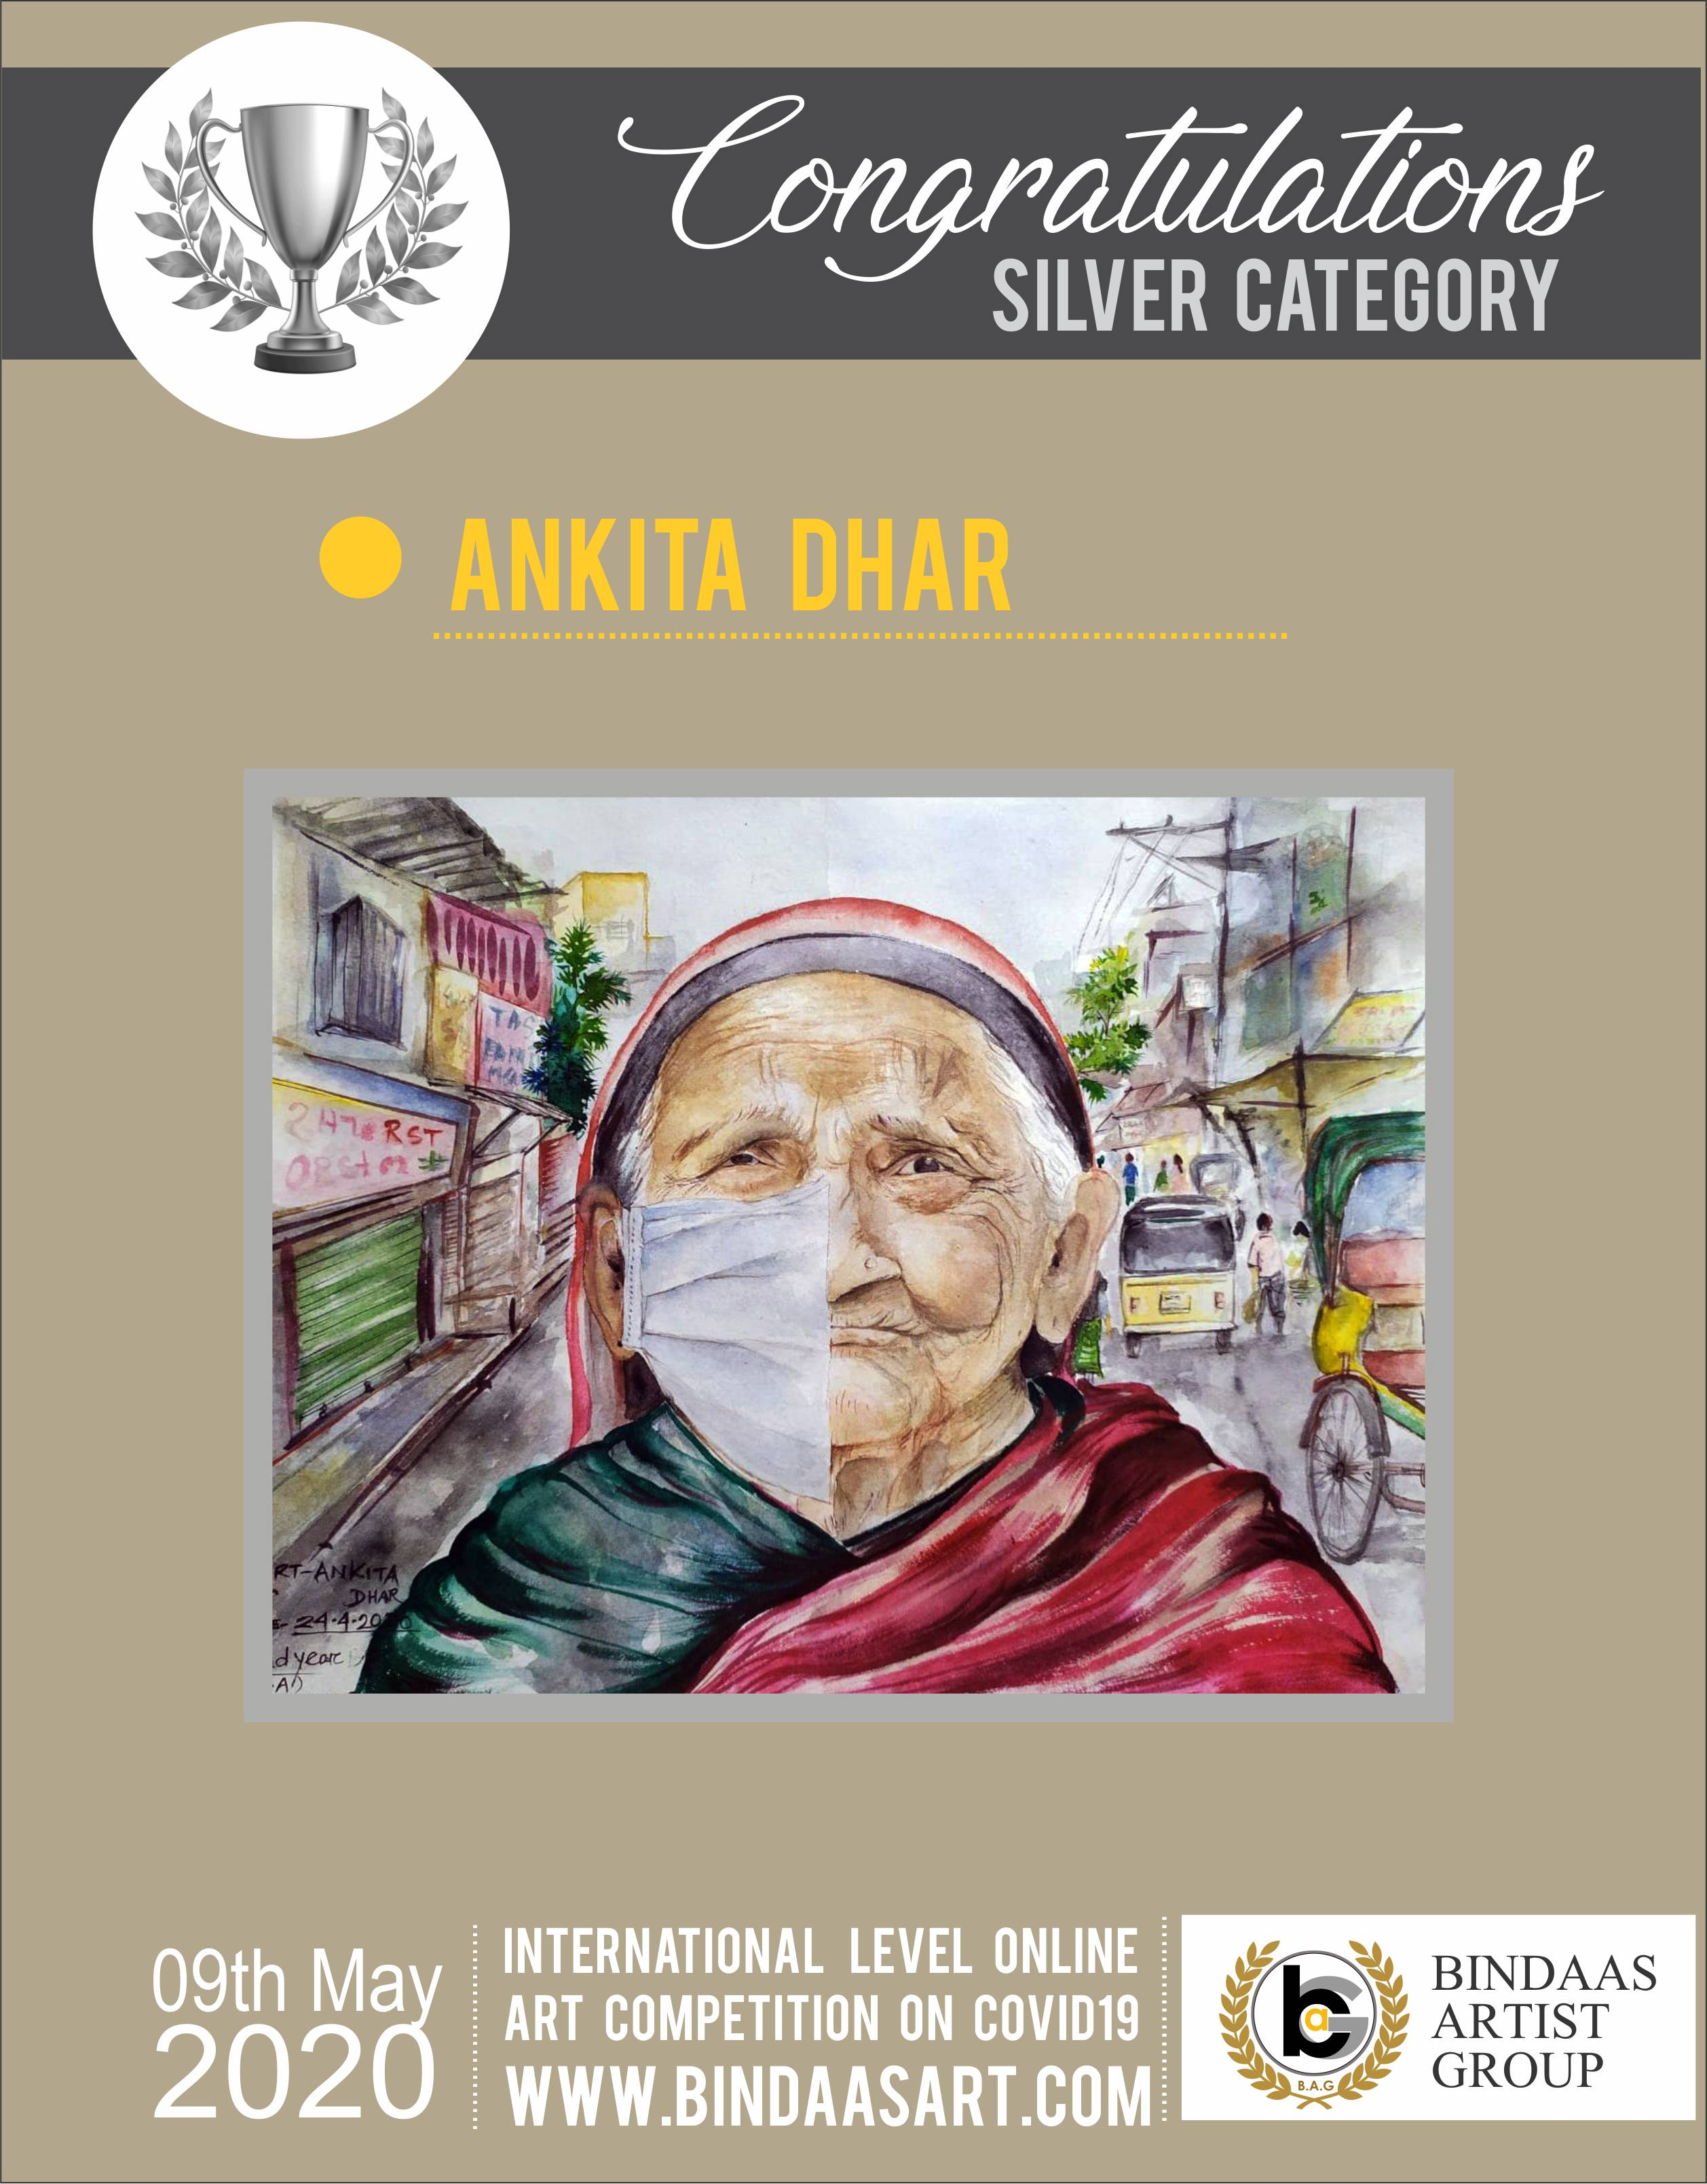 Ankita Dhar